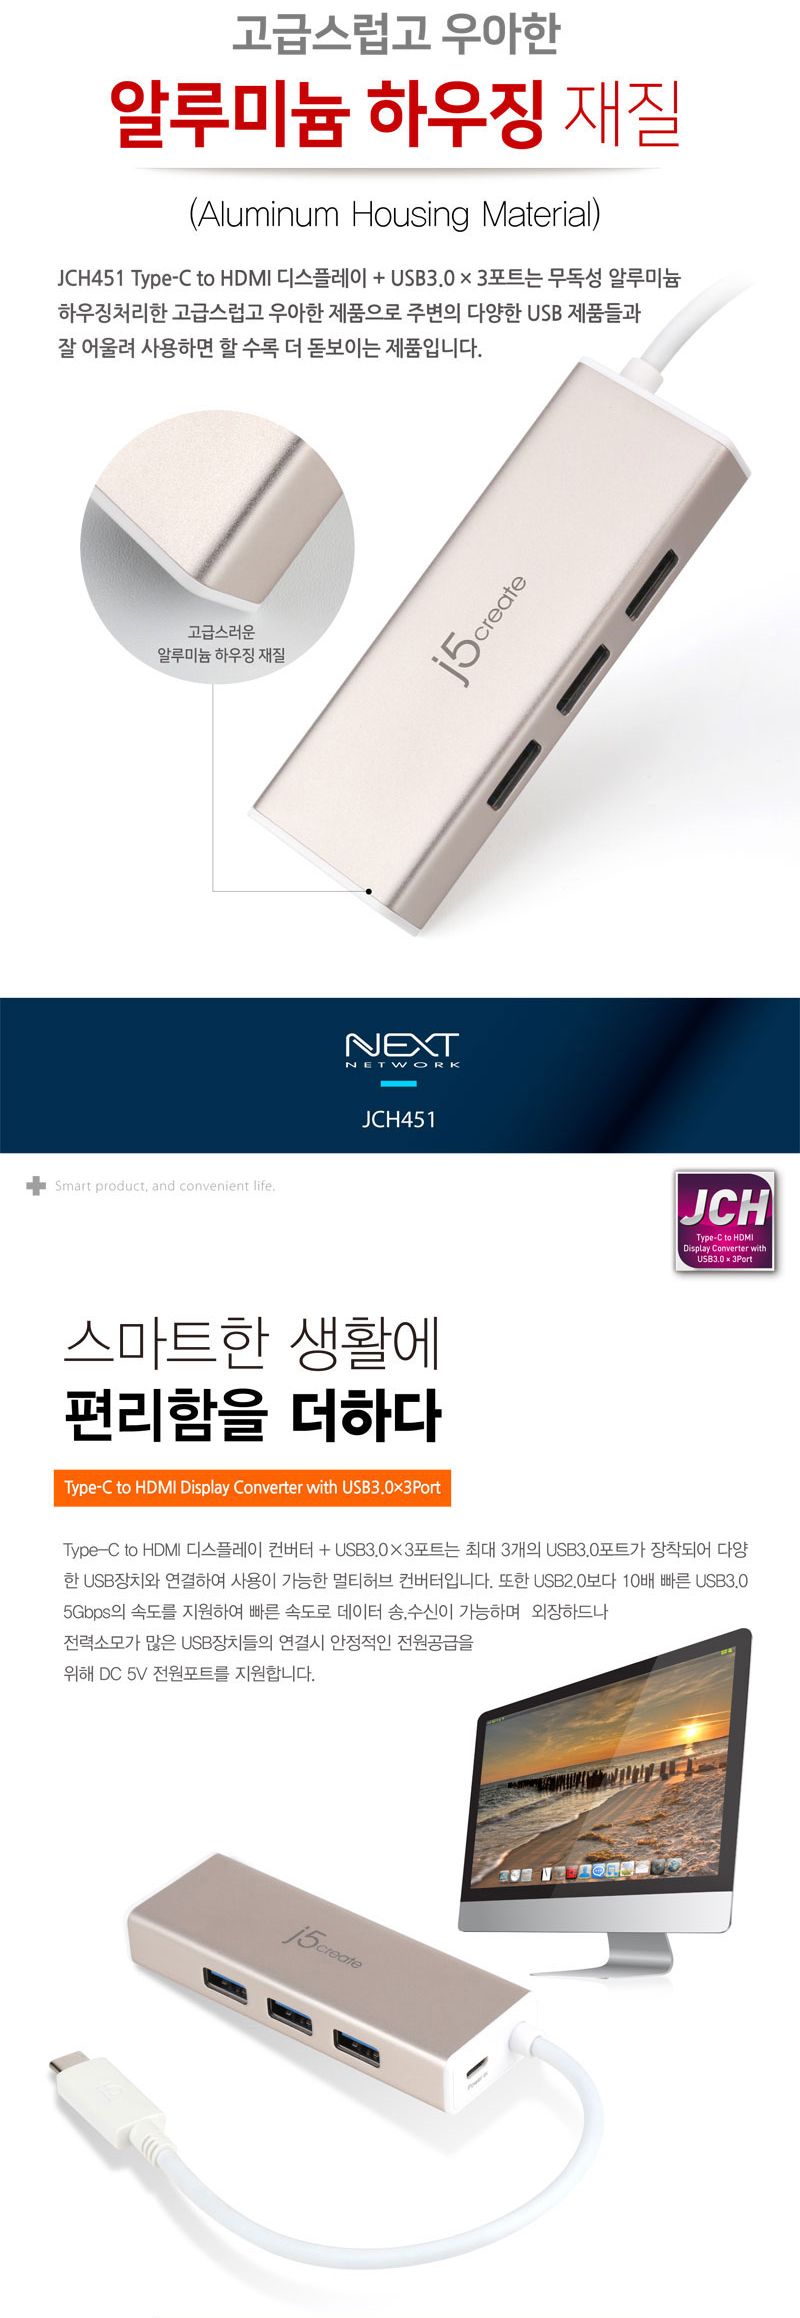 j5create  3포트 Type C 멀티 허브 with HDMI (JCH451)